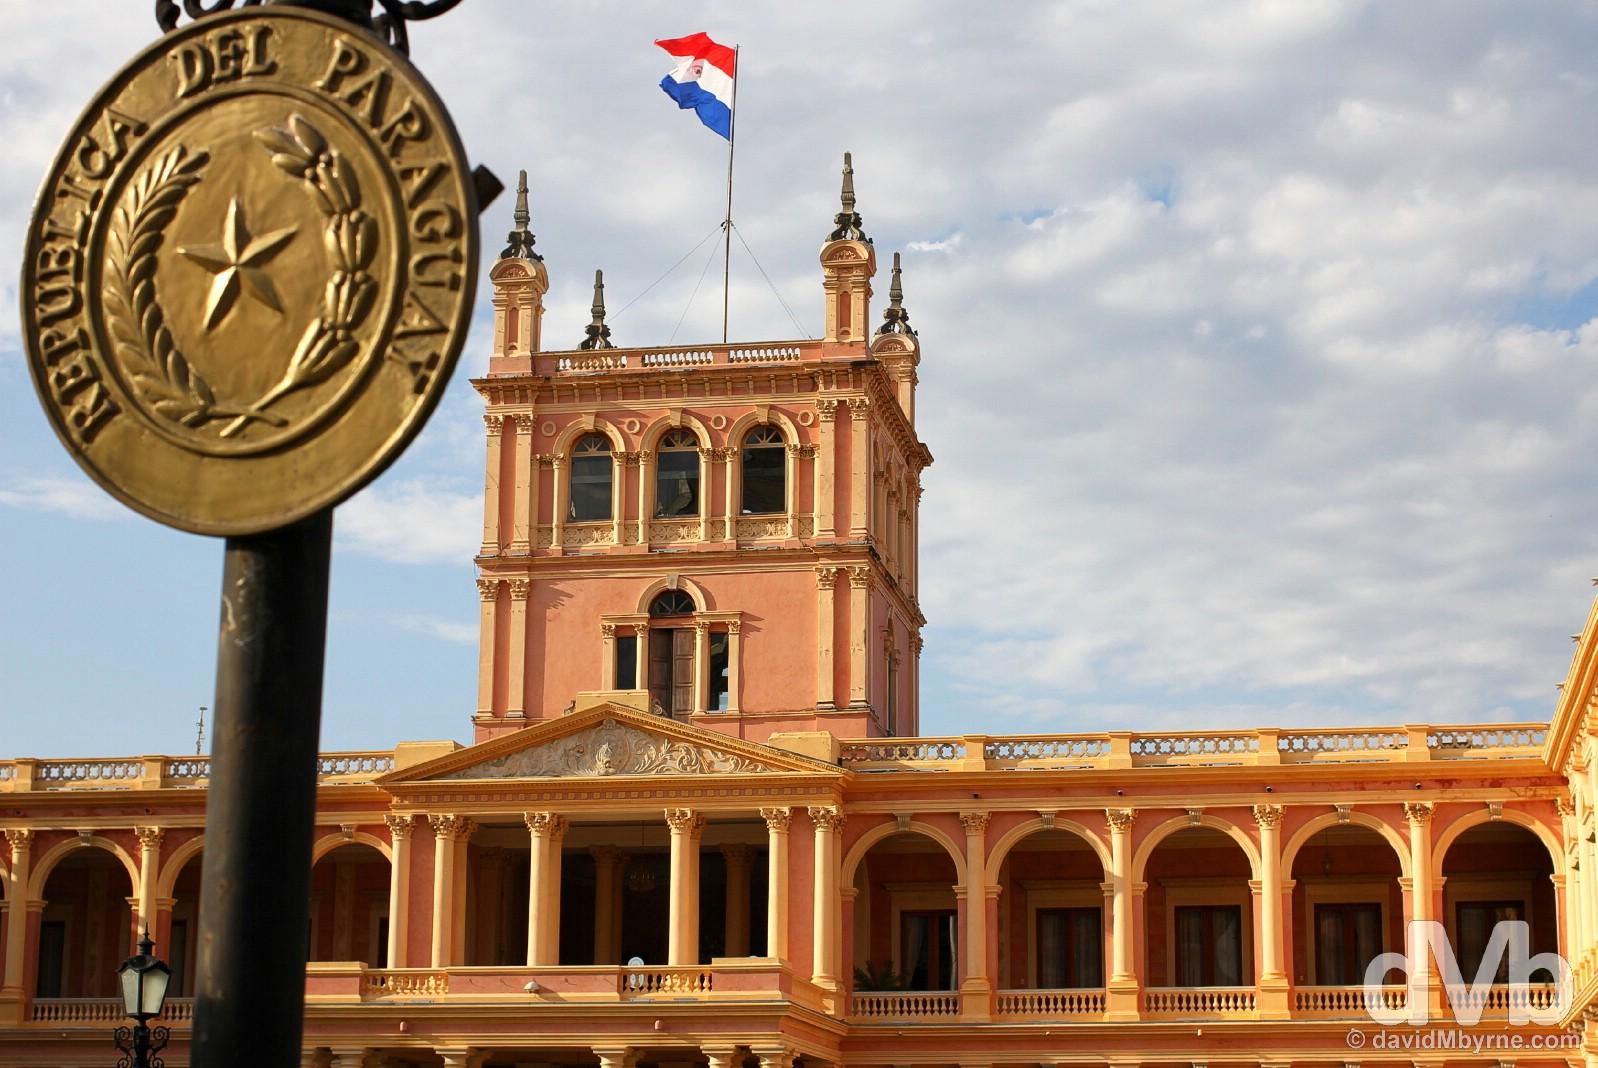 The Paraguayan seat of government, the Placio de Gobierno in Asuncion, Paraguay. September 9, 2015.